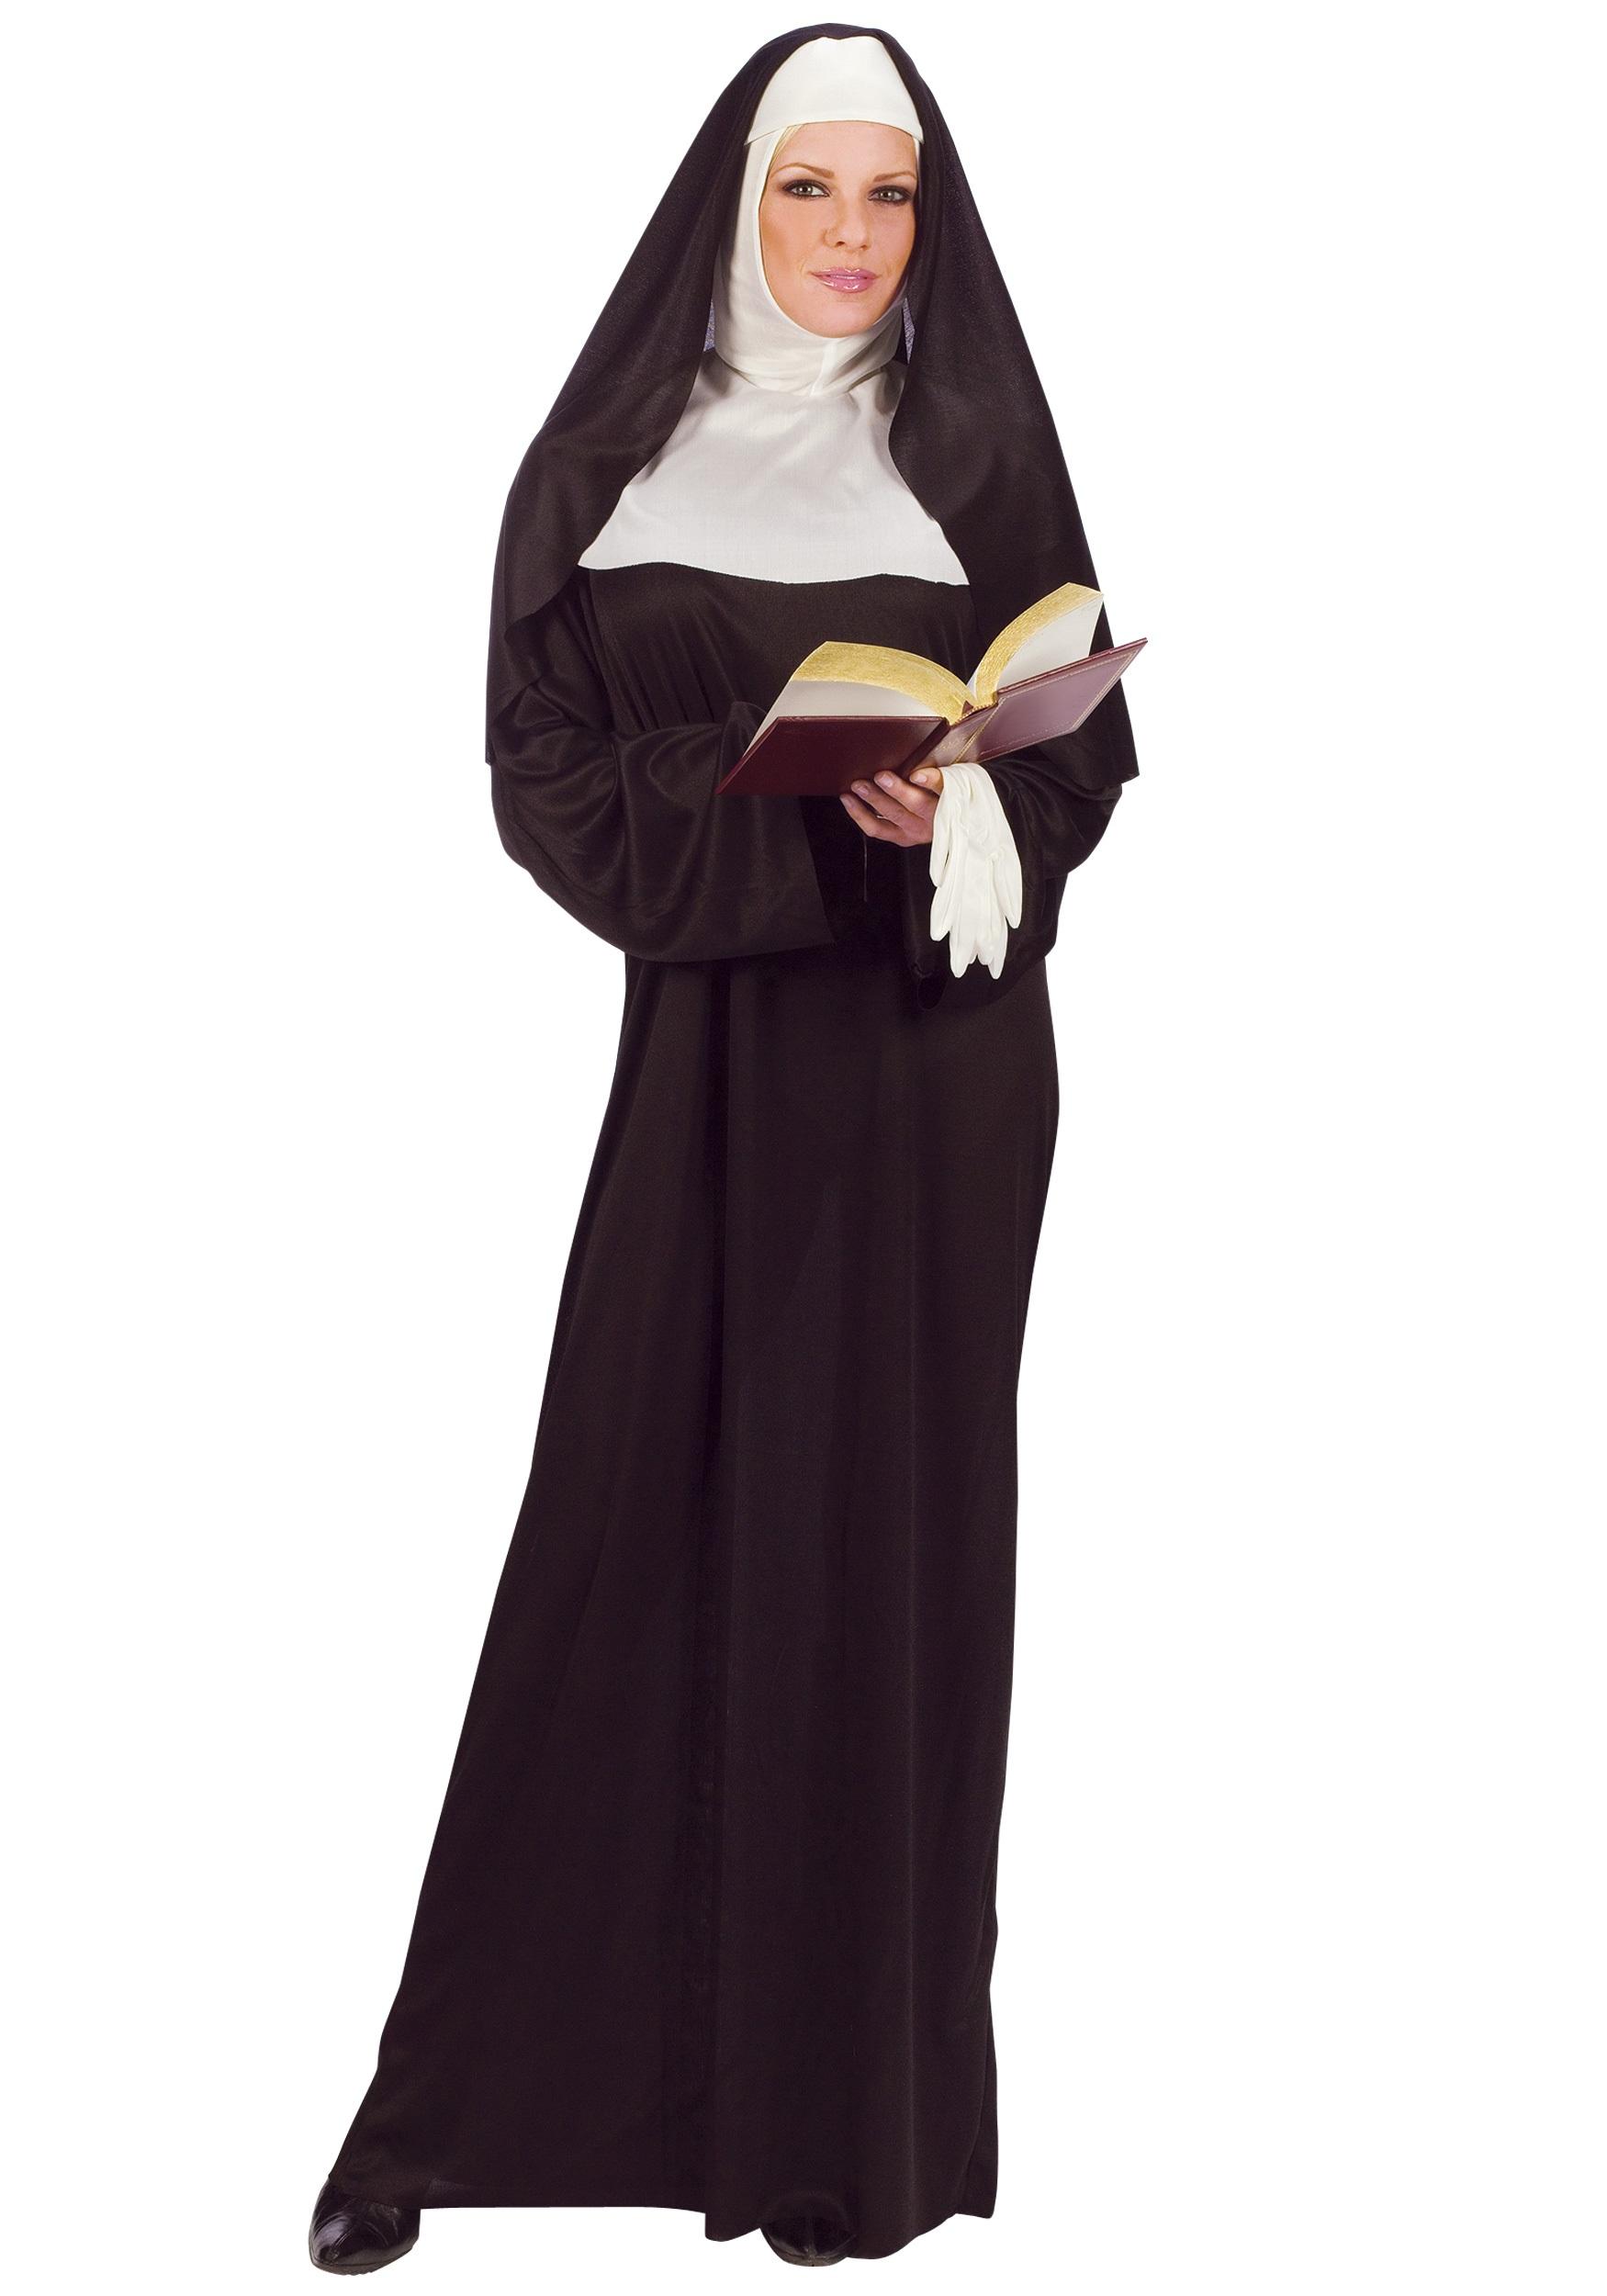 nun sister mother nude Mother Superior Nun Costume